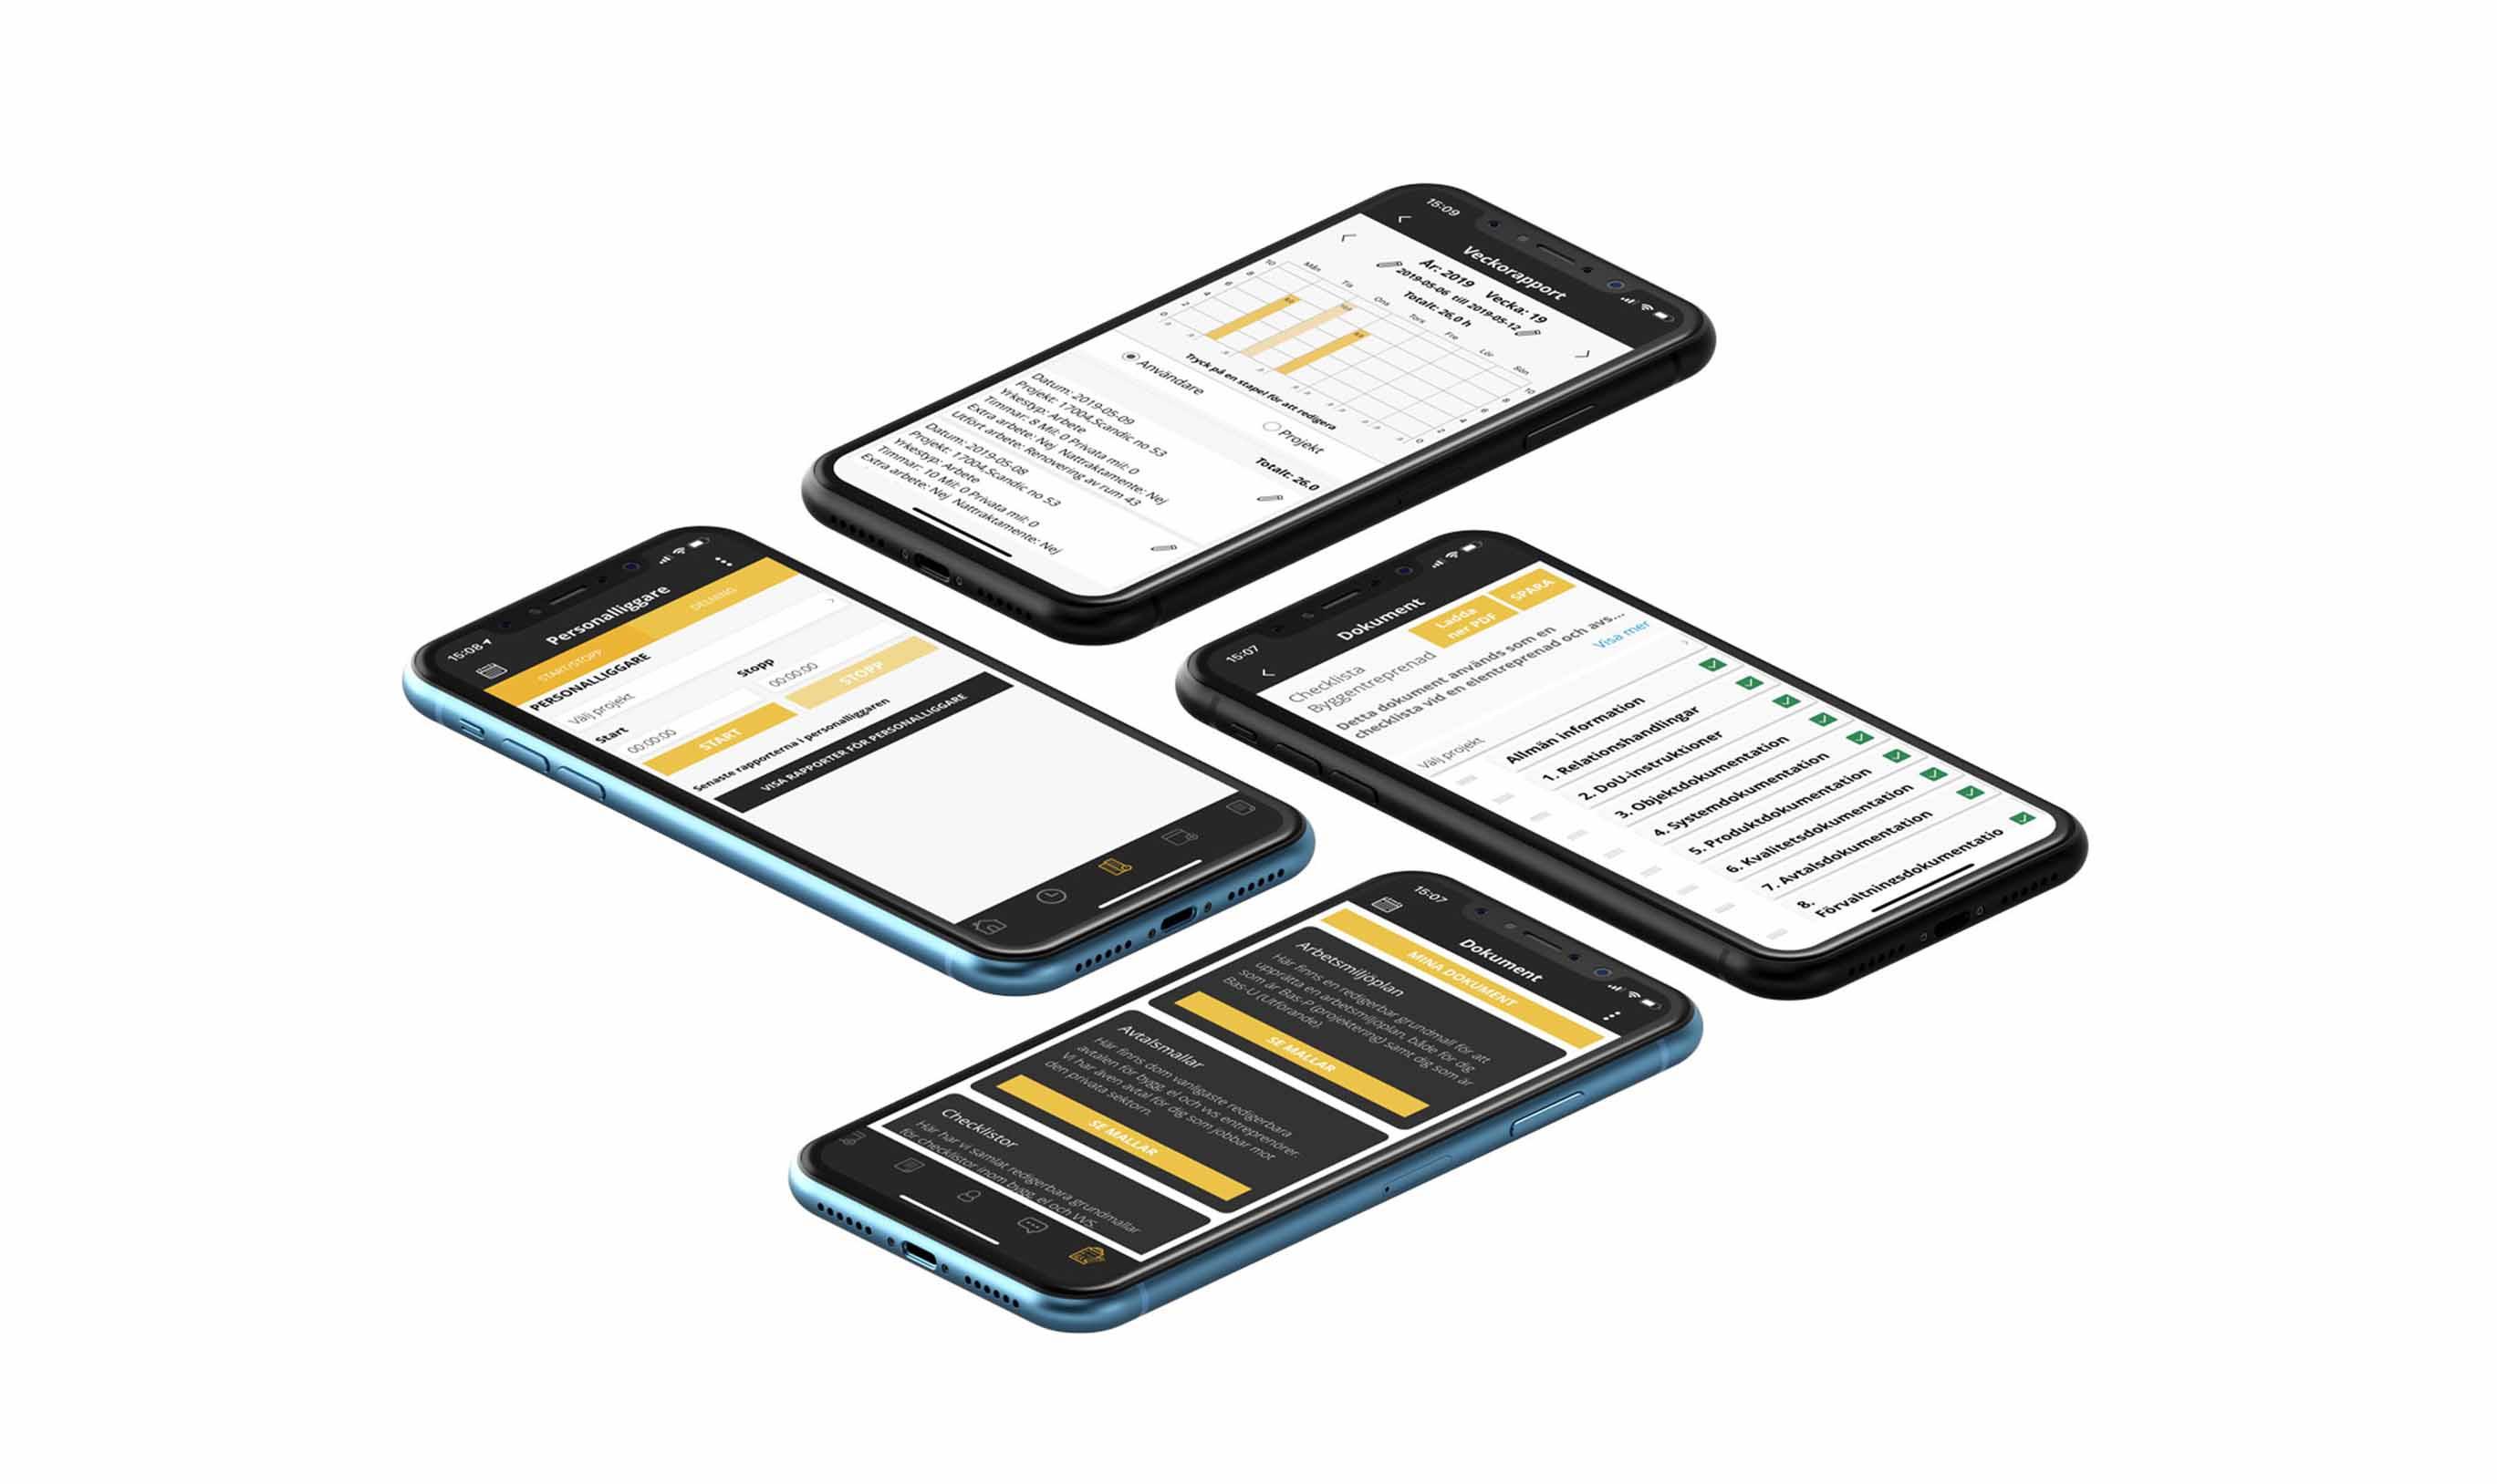 Struqturs tidrapportering mobilapp